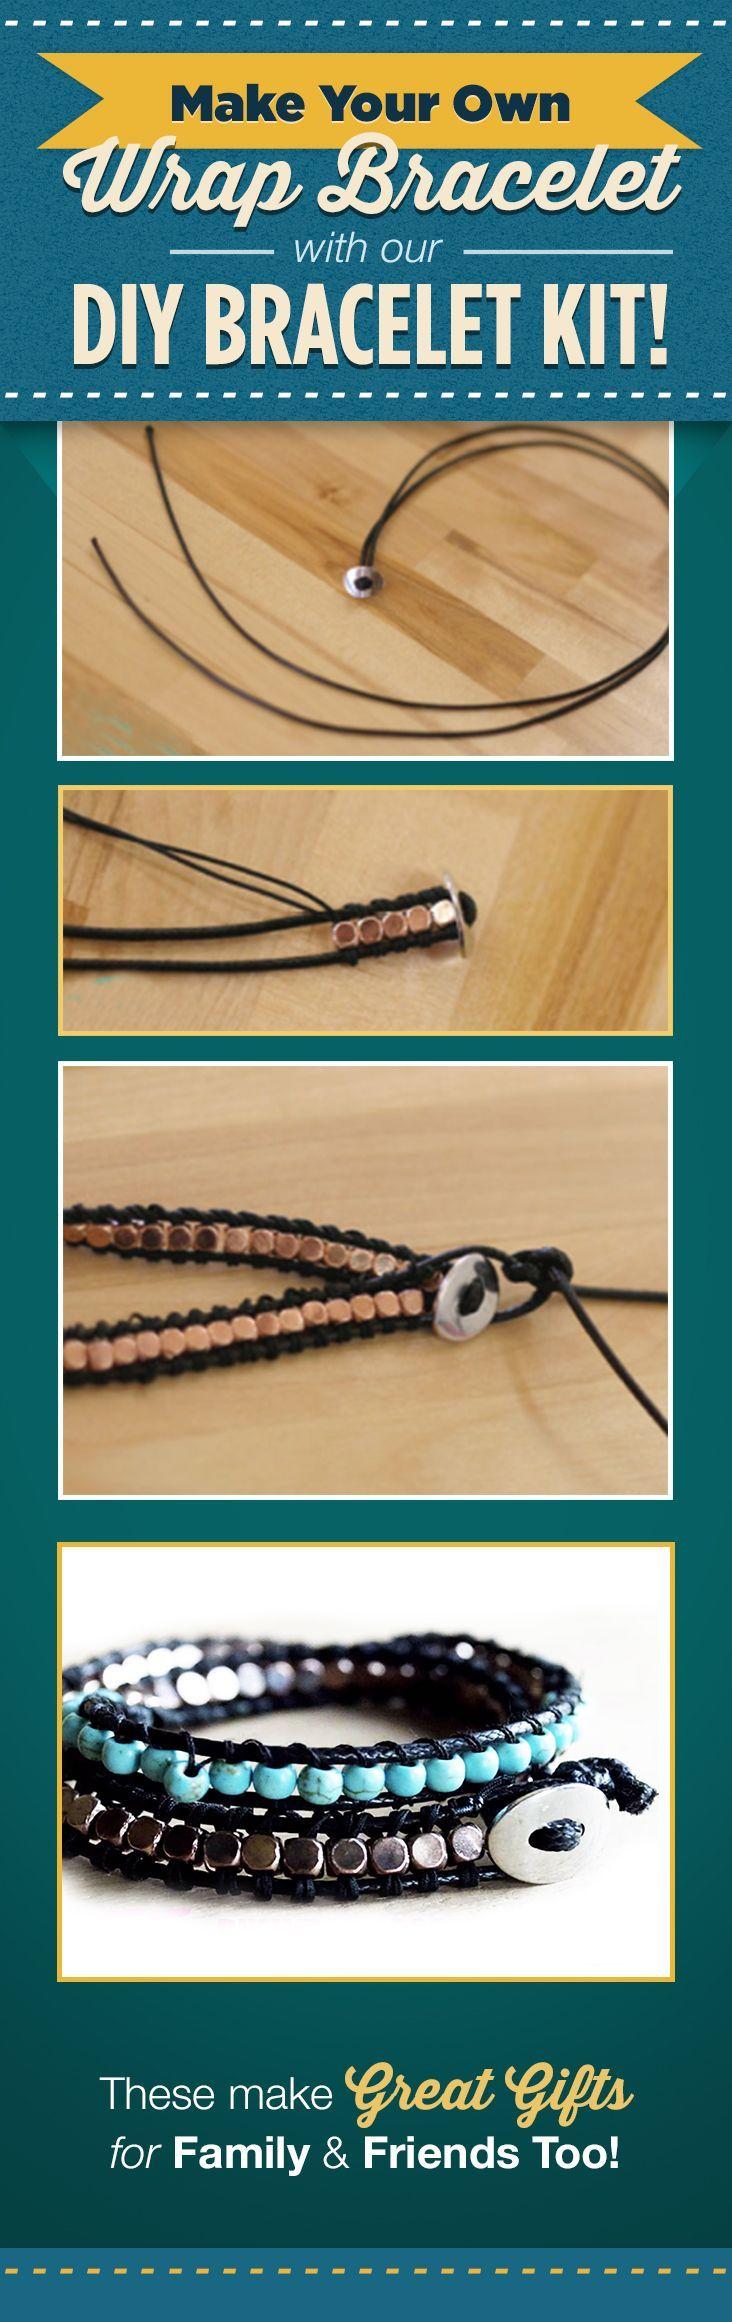 Make your own Wrap Bracelet with our DIY Bracelet Kit by DIY Ready at diyready.com